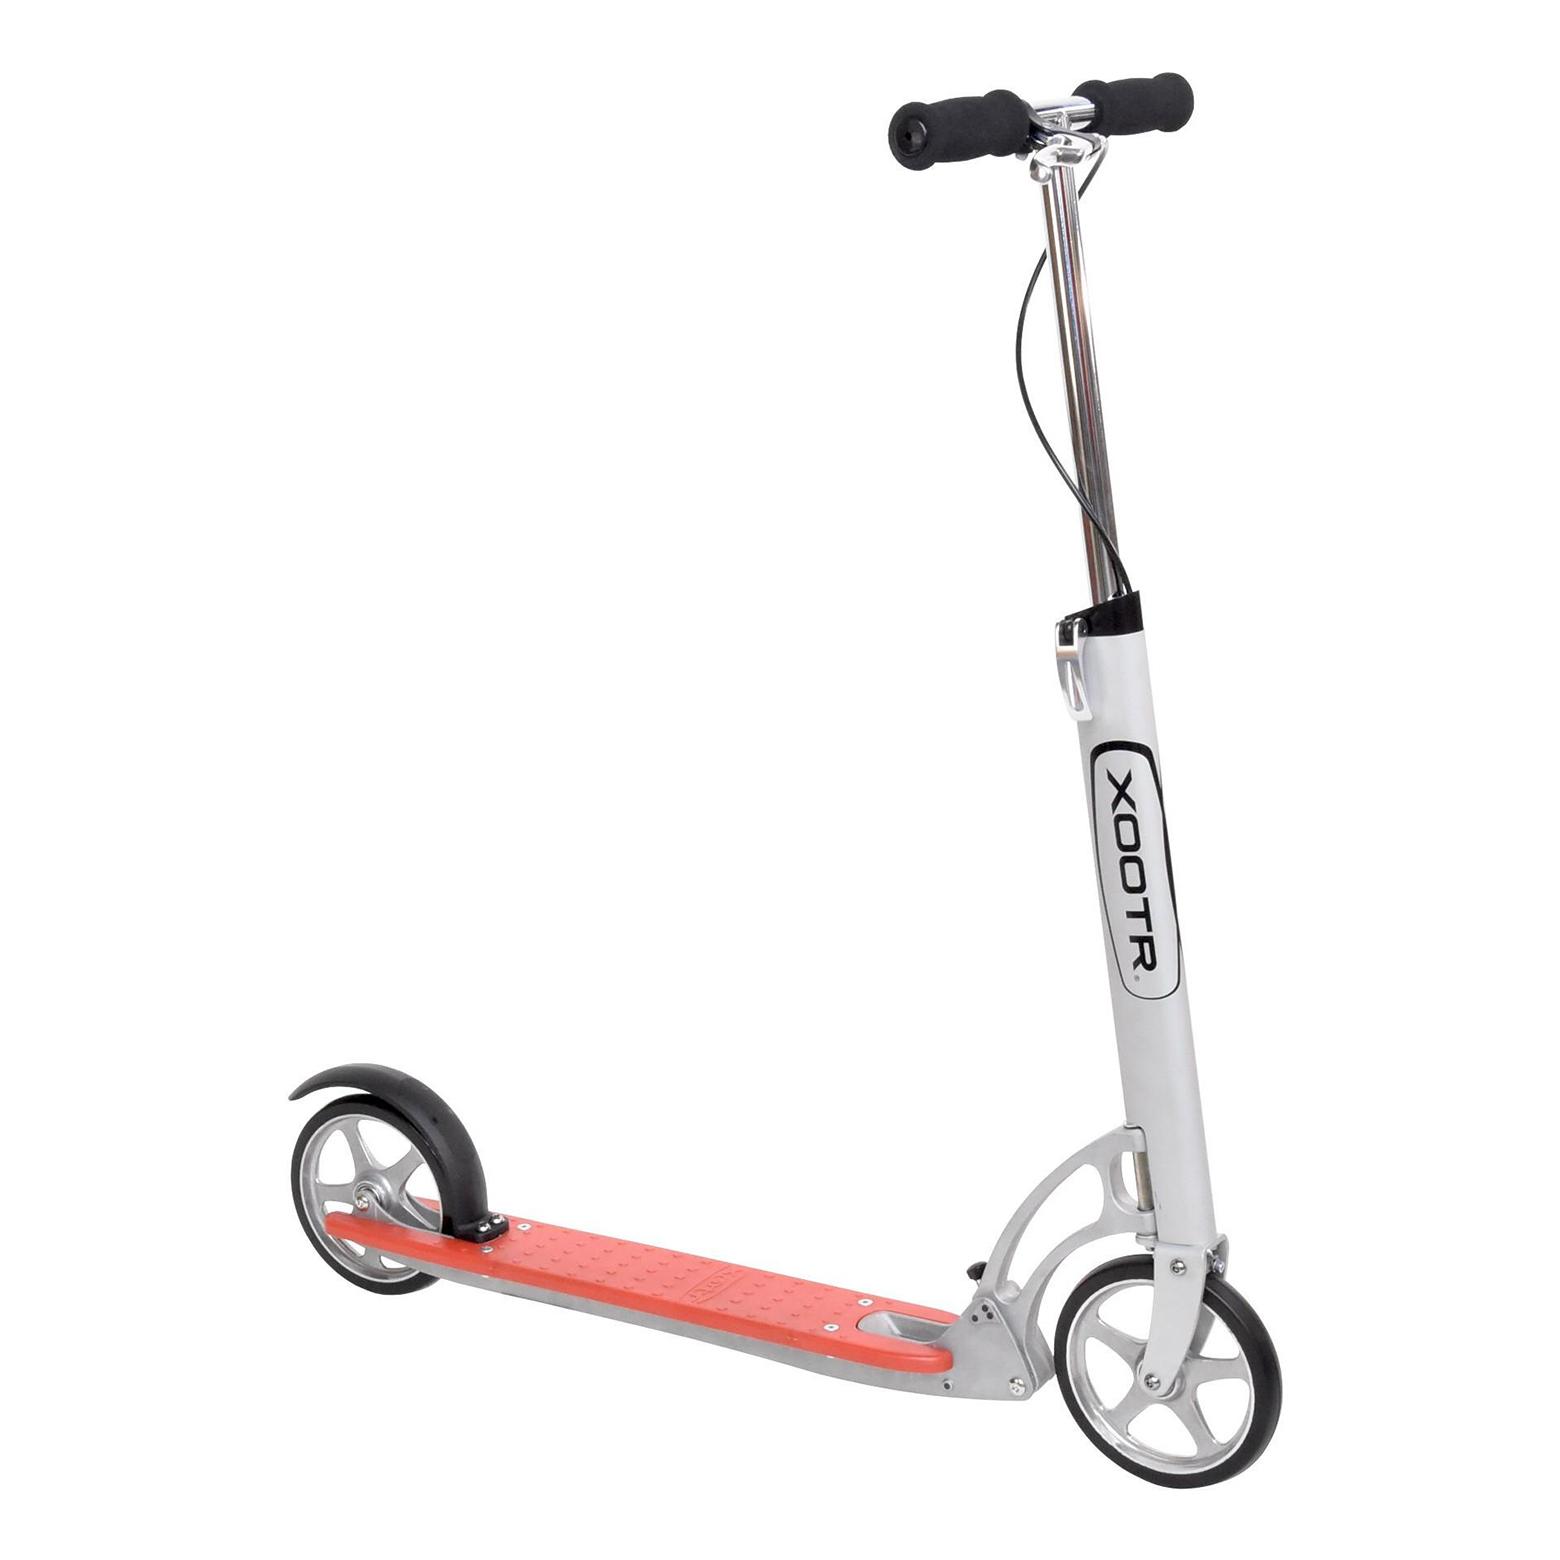 Xootr Dash red